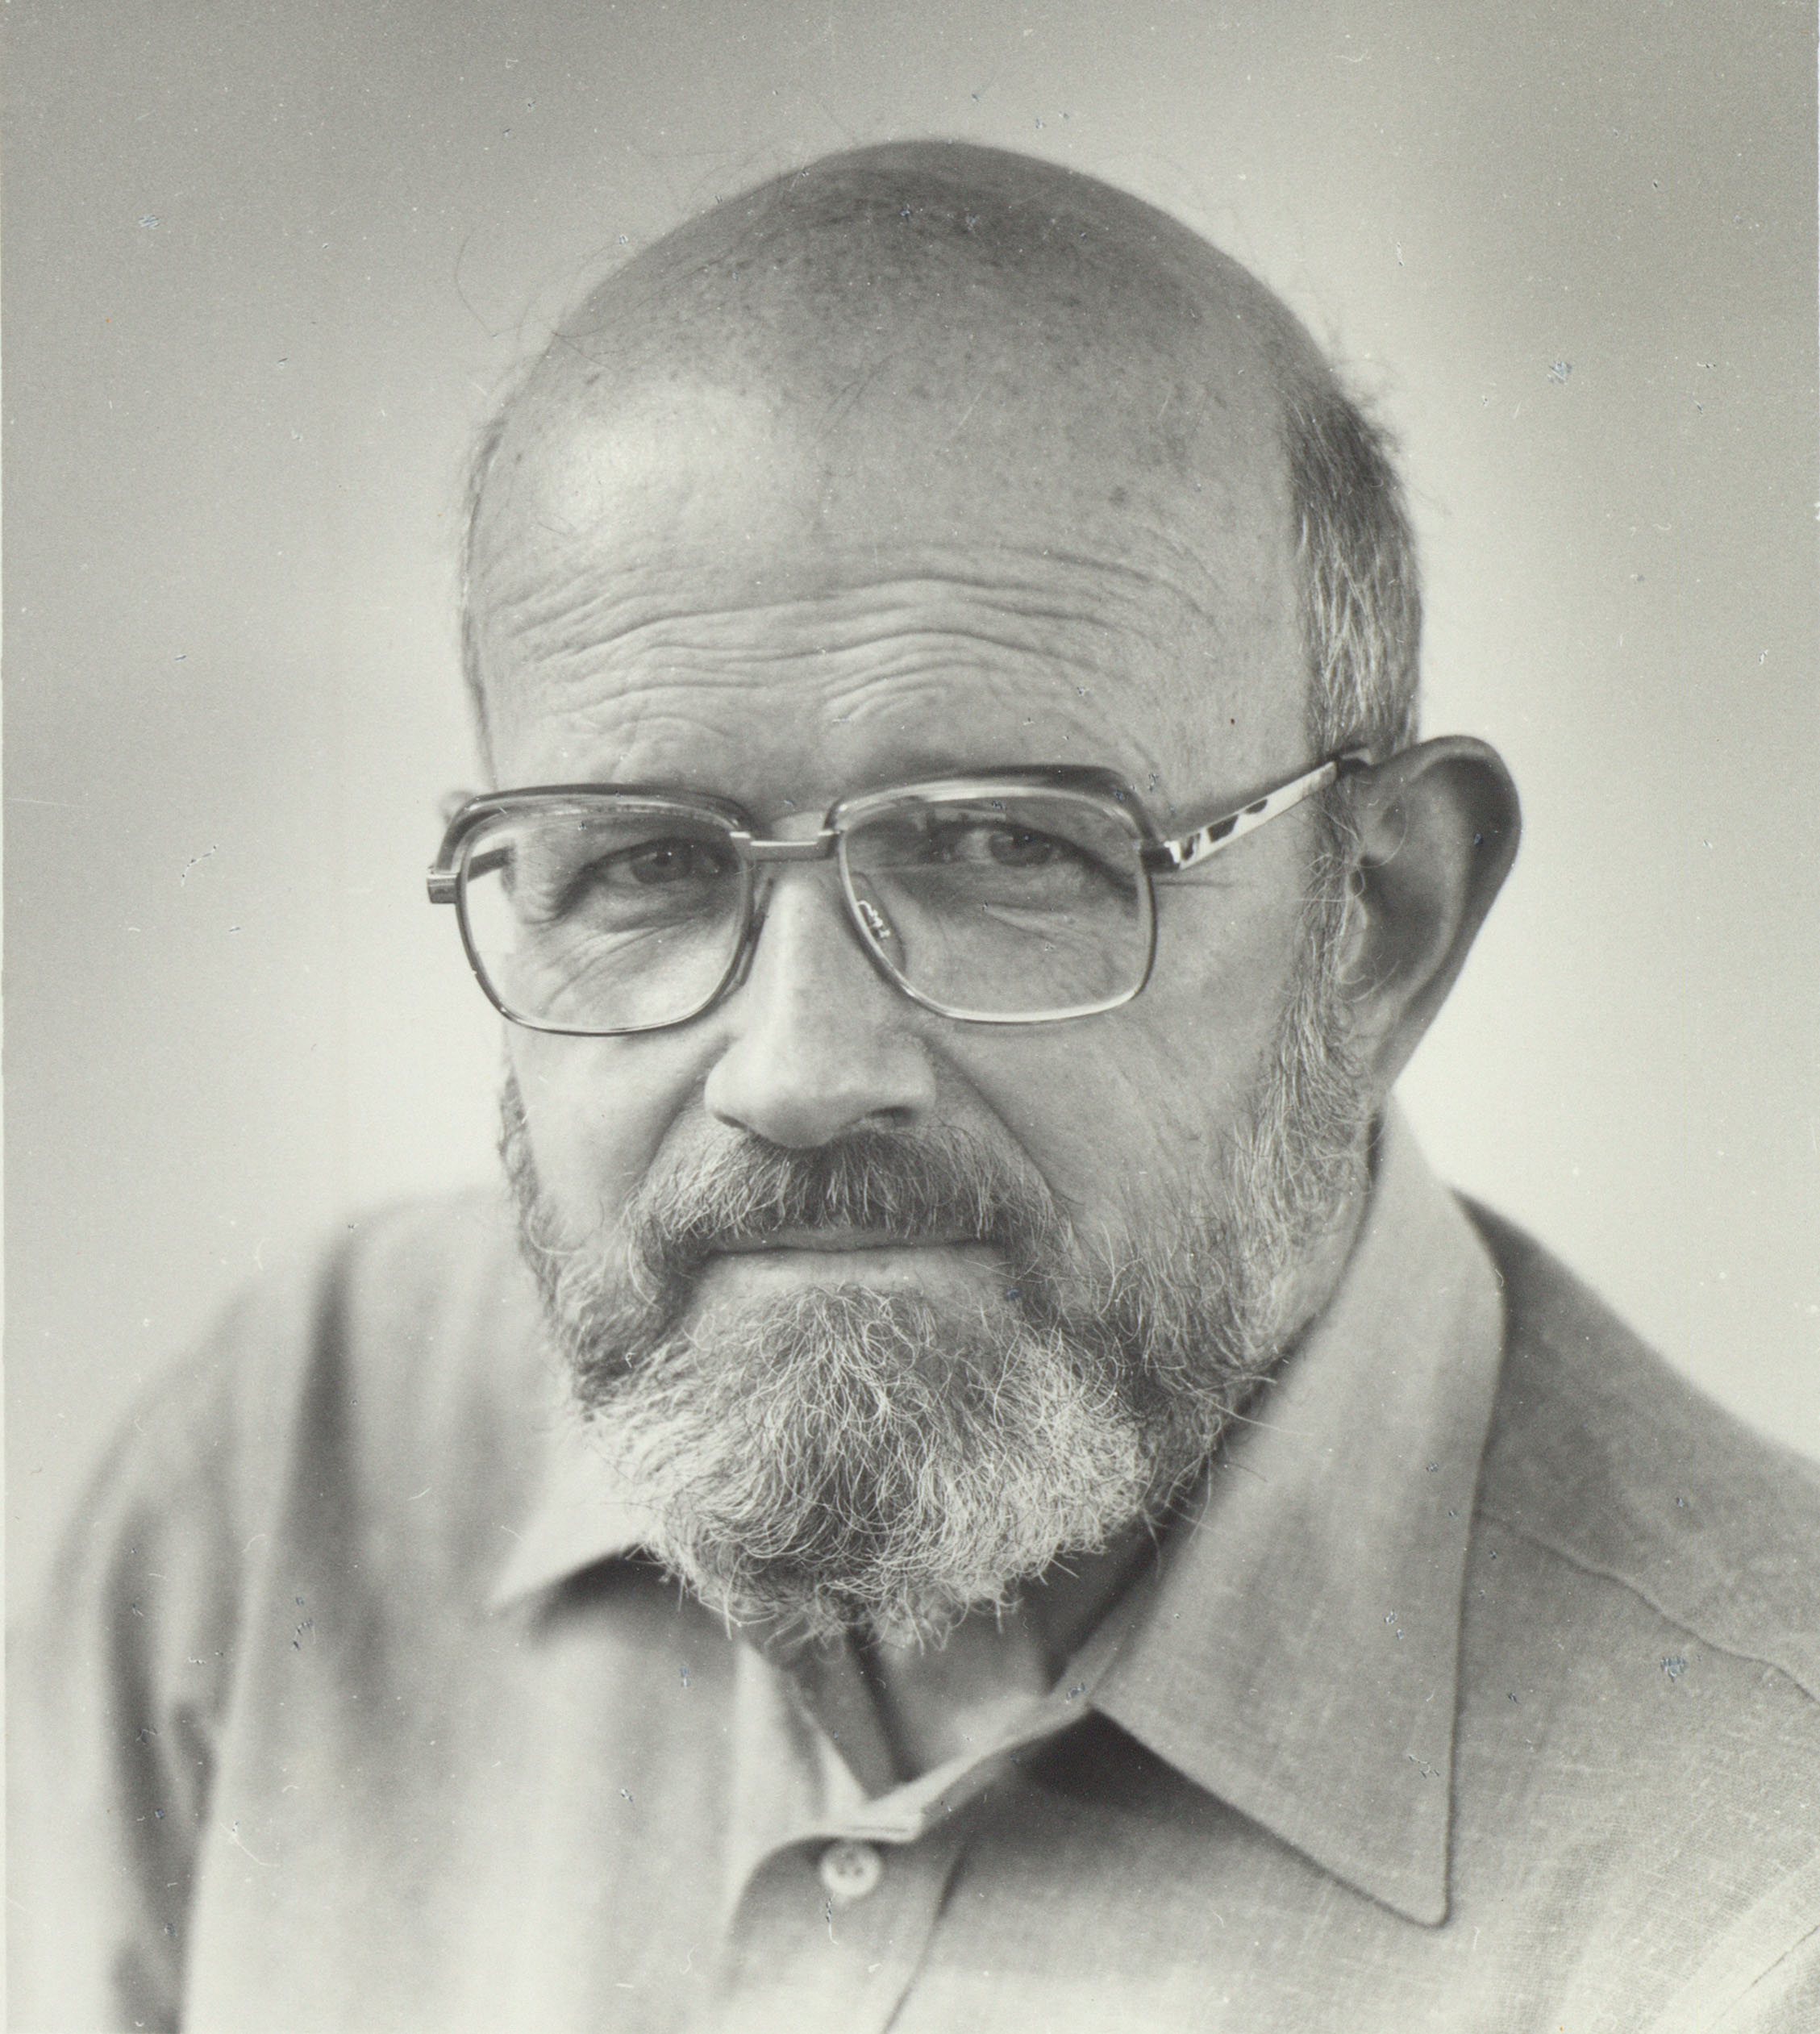 Walter Morrison